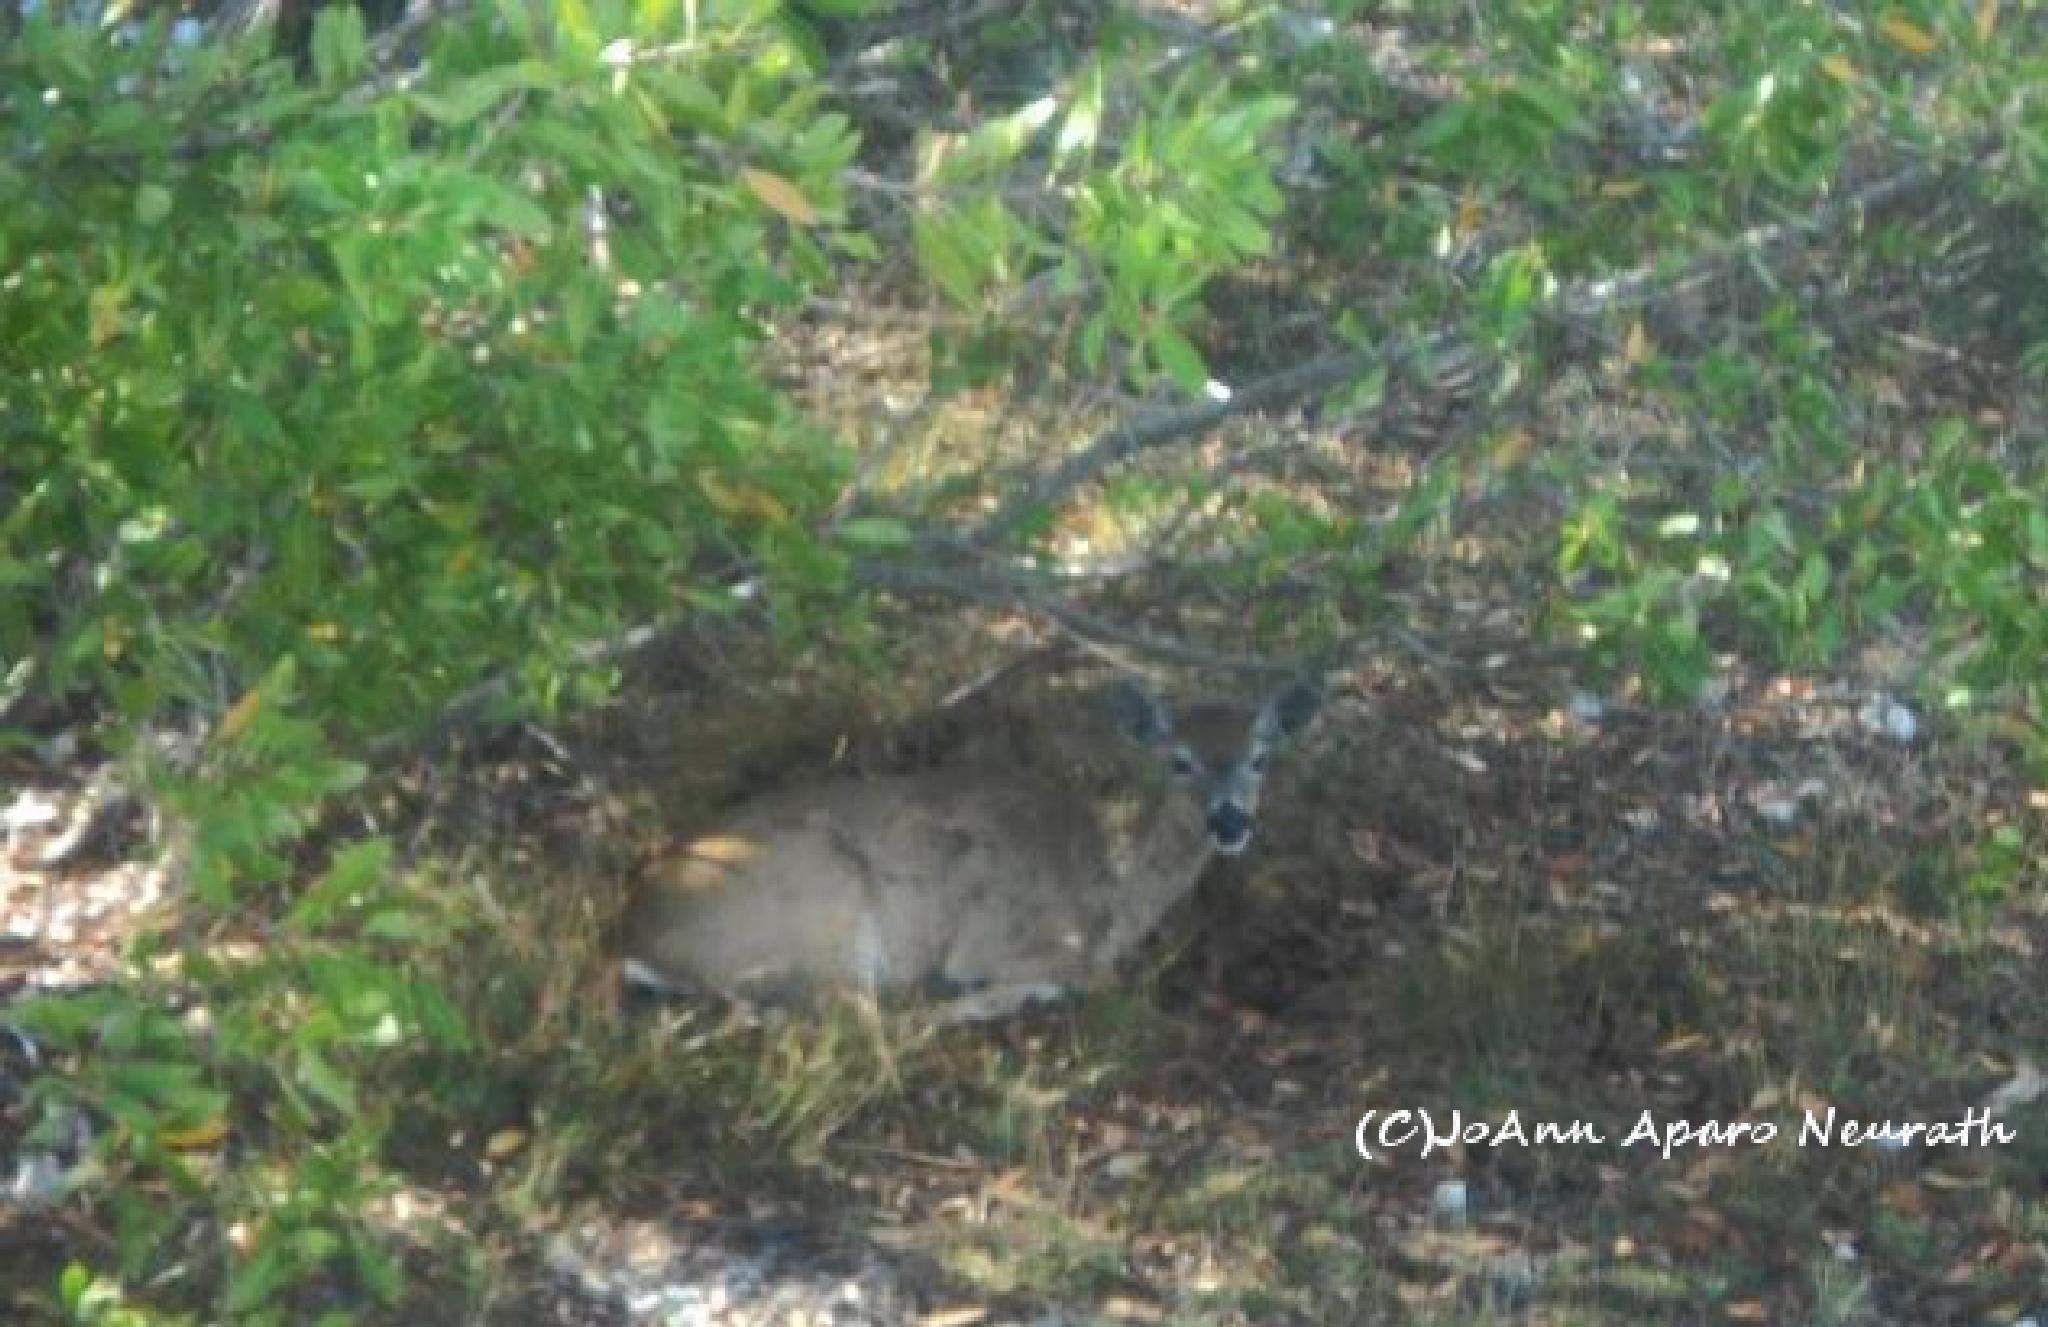 Key Deer resting by JoAnn.Aparo.Neurath